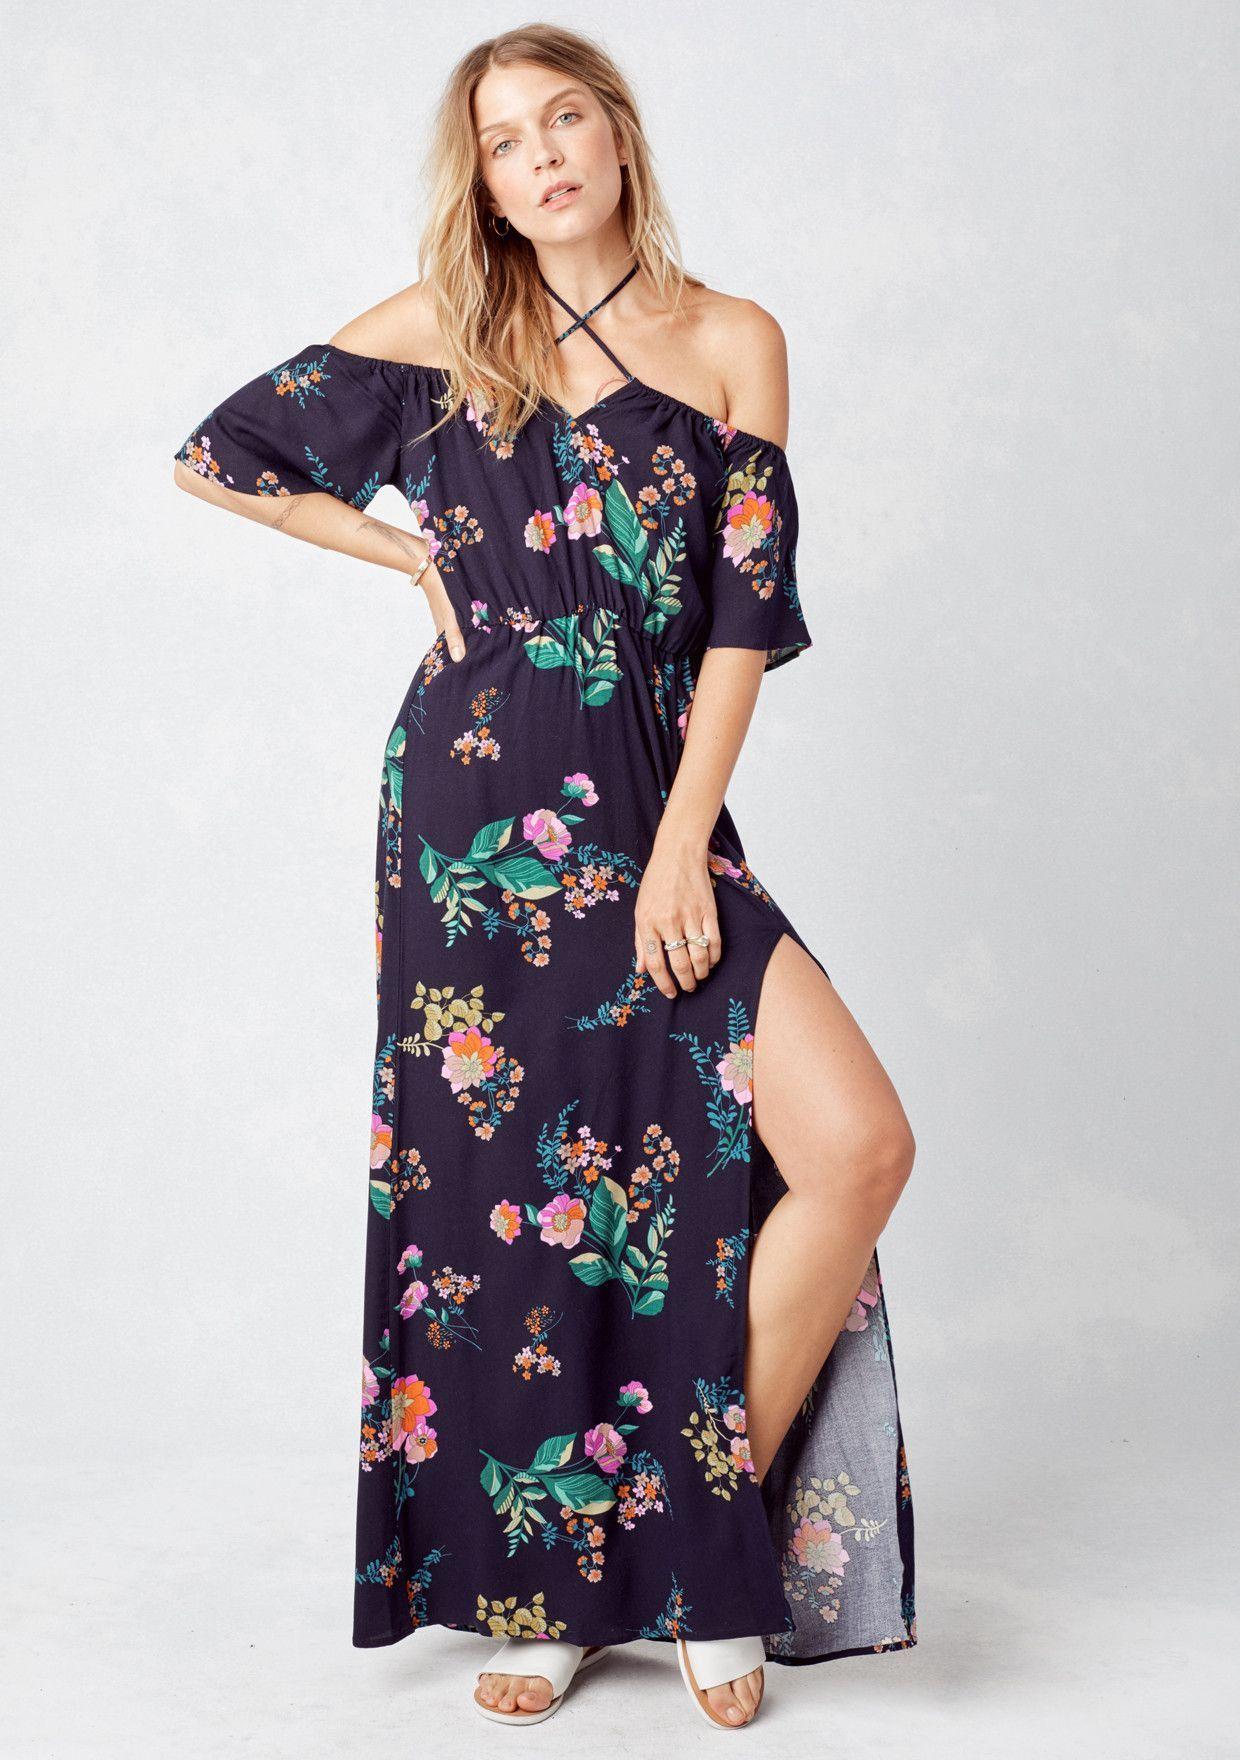 Zuzu floral maxi dress products